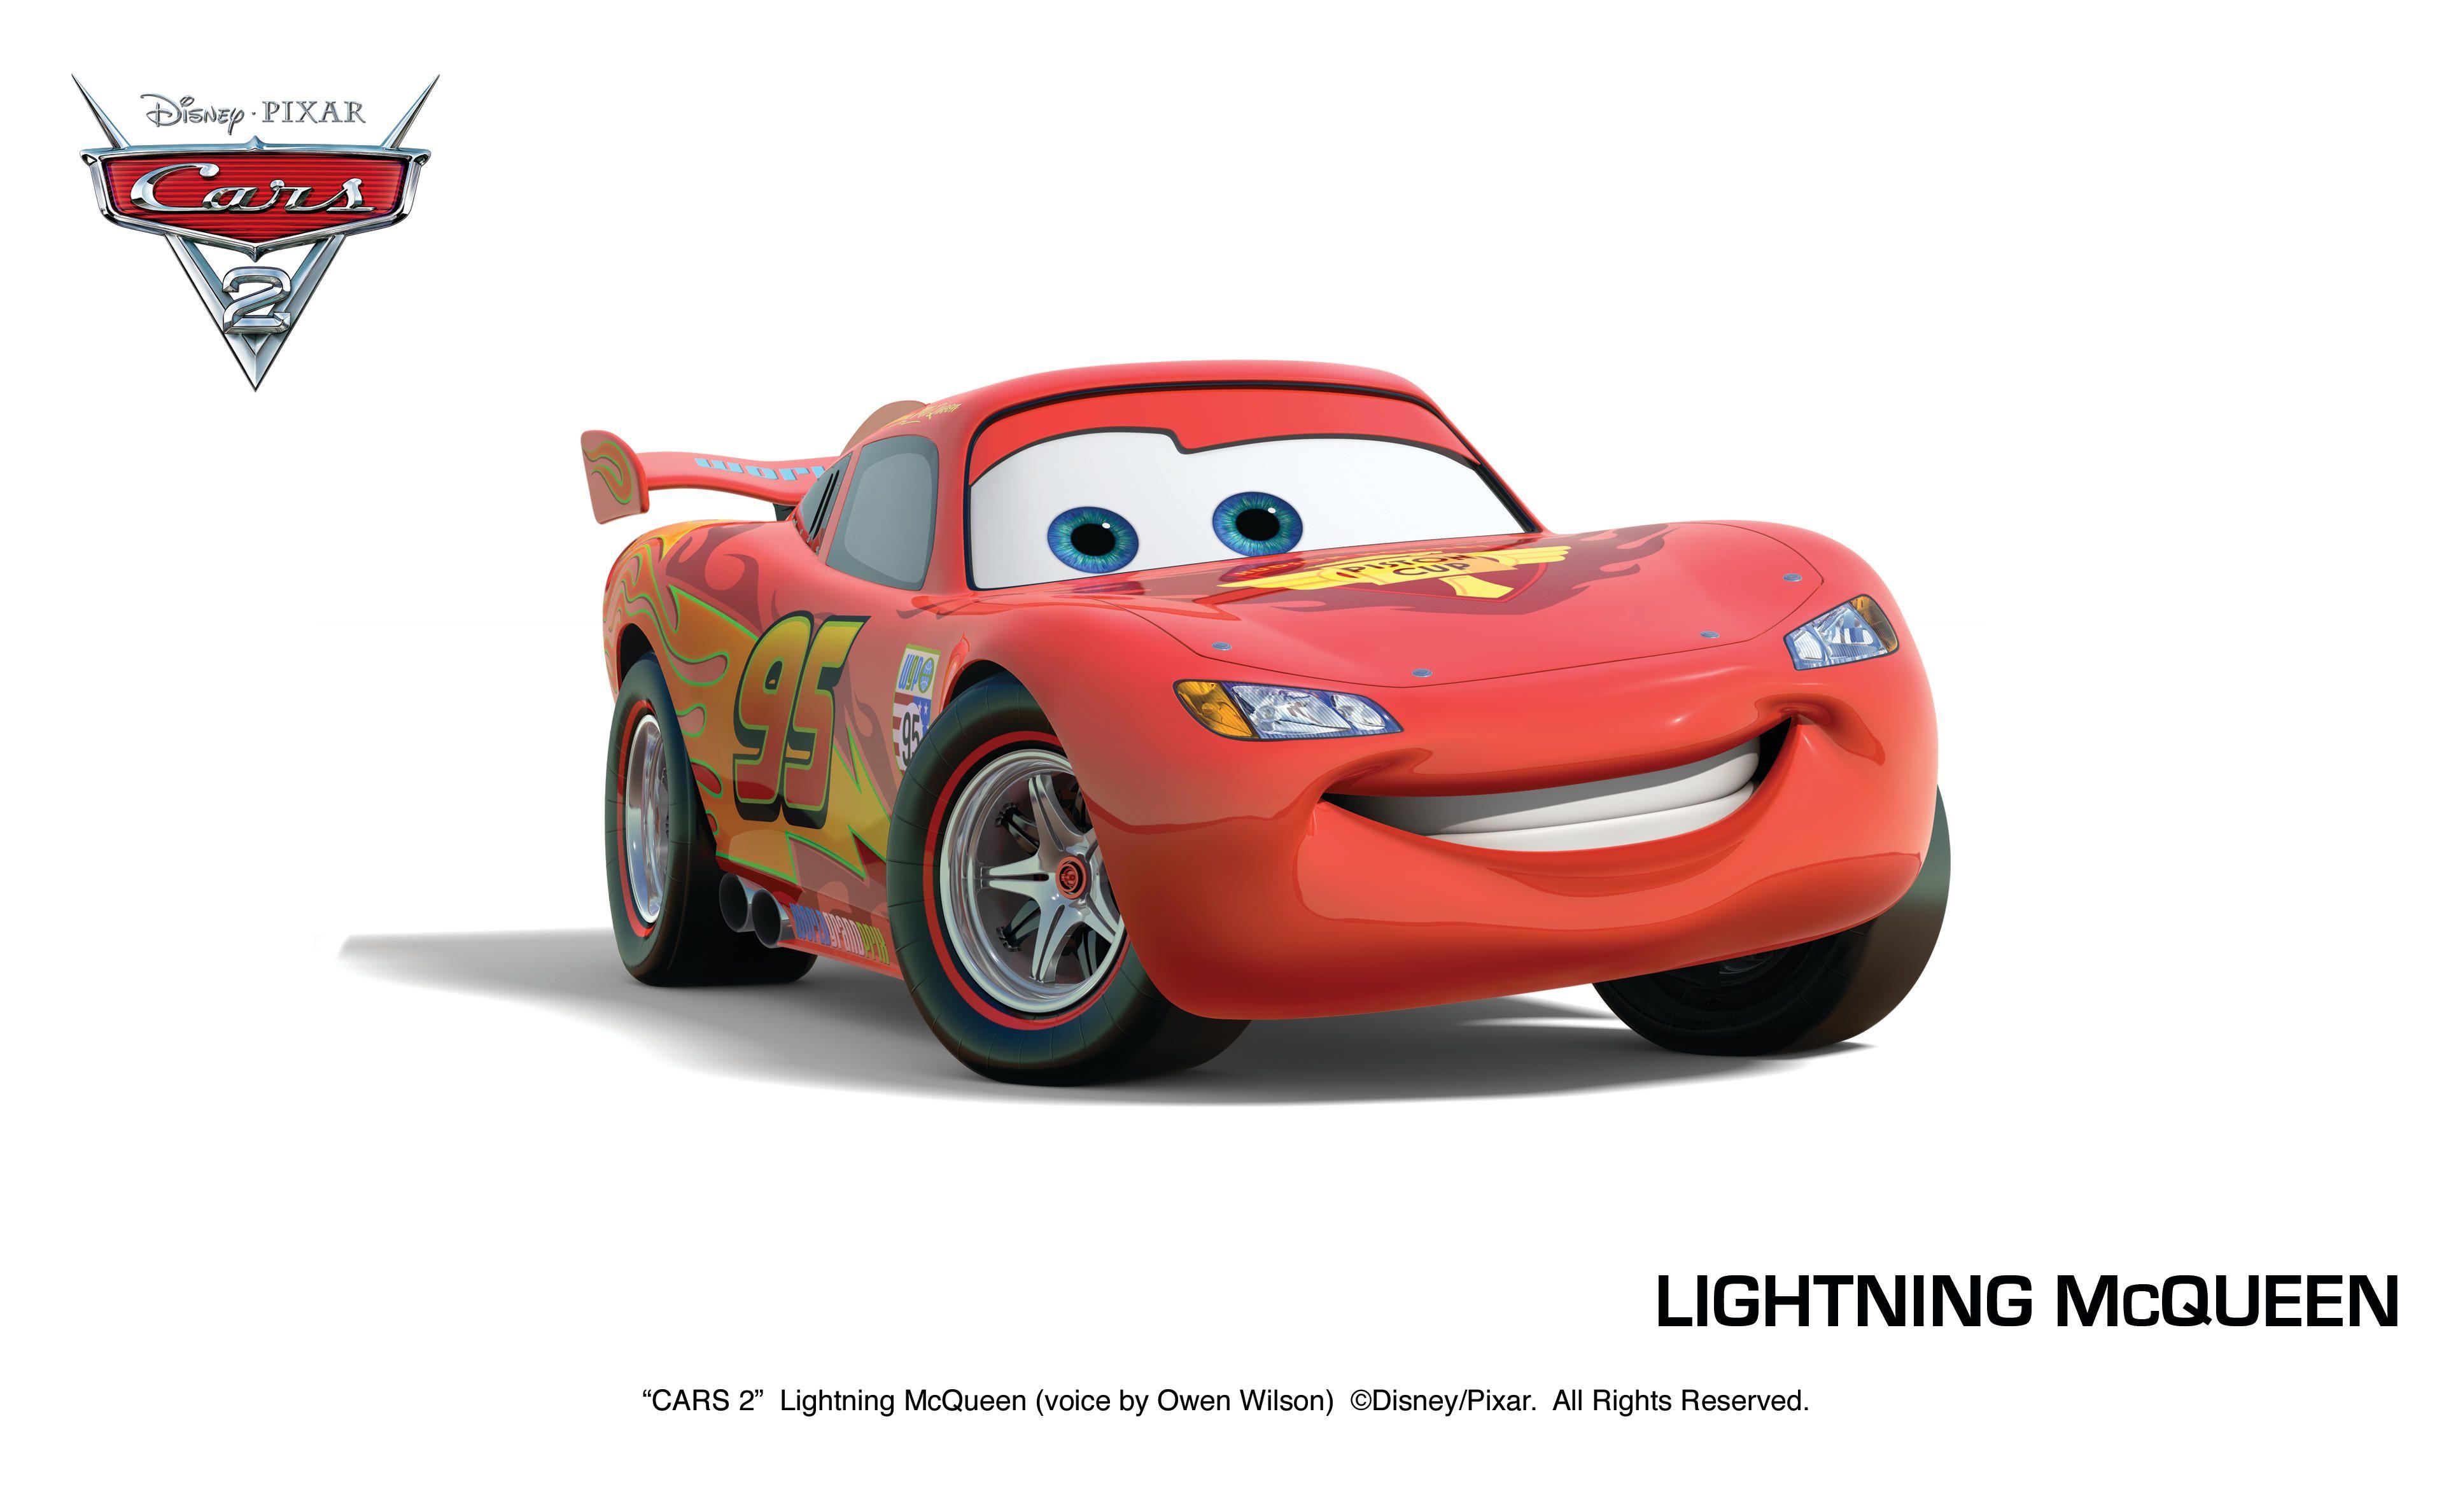 printable cars images Disney, Disegni animati, Immagini